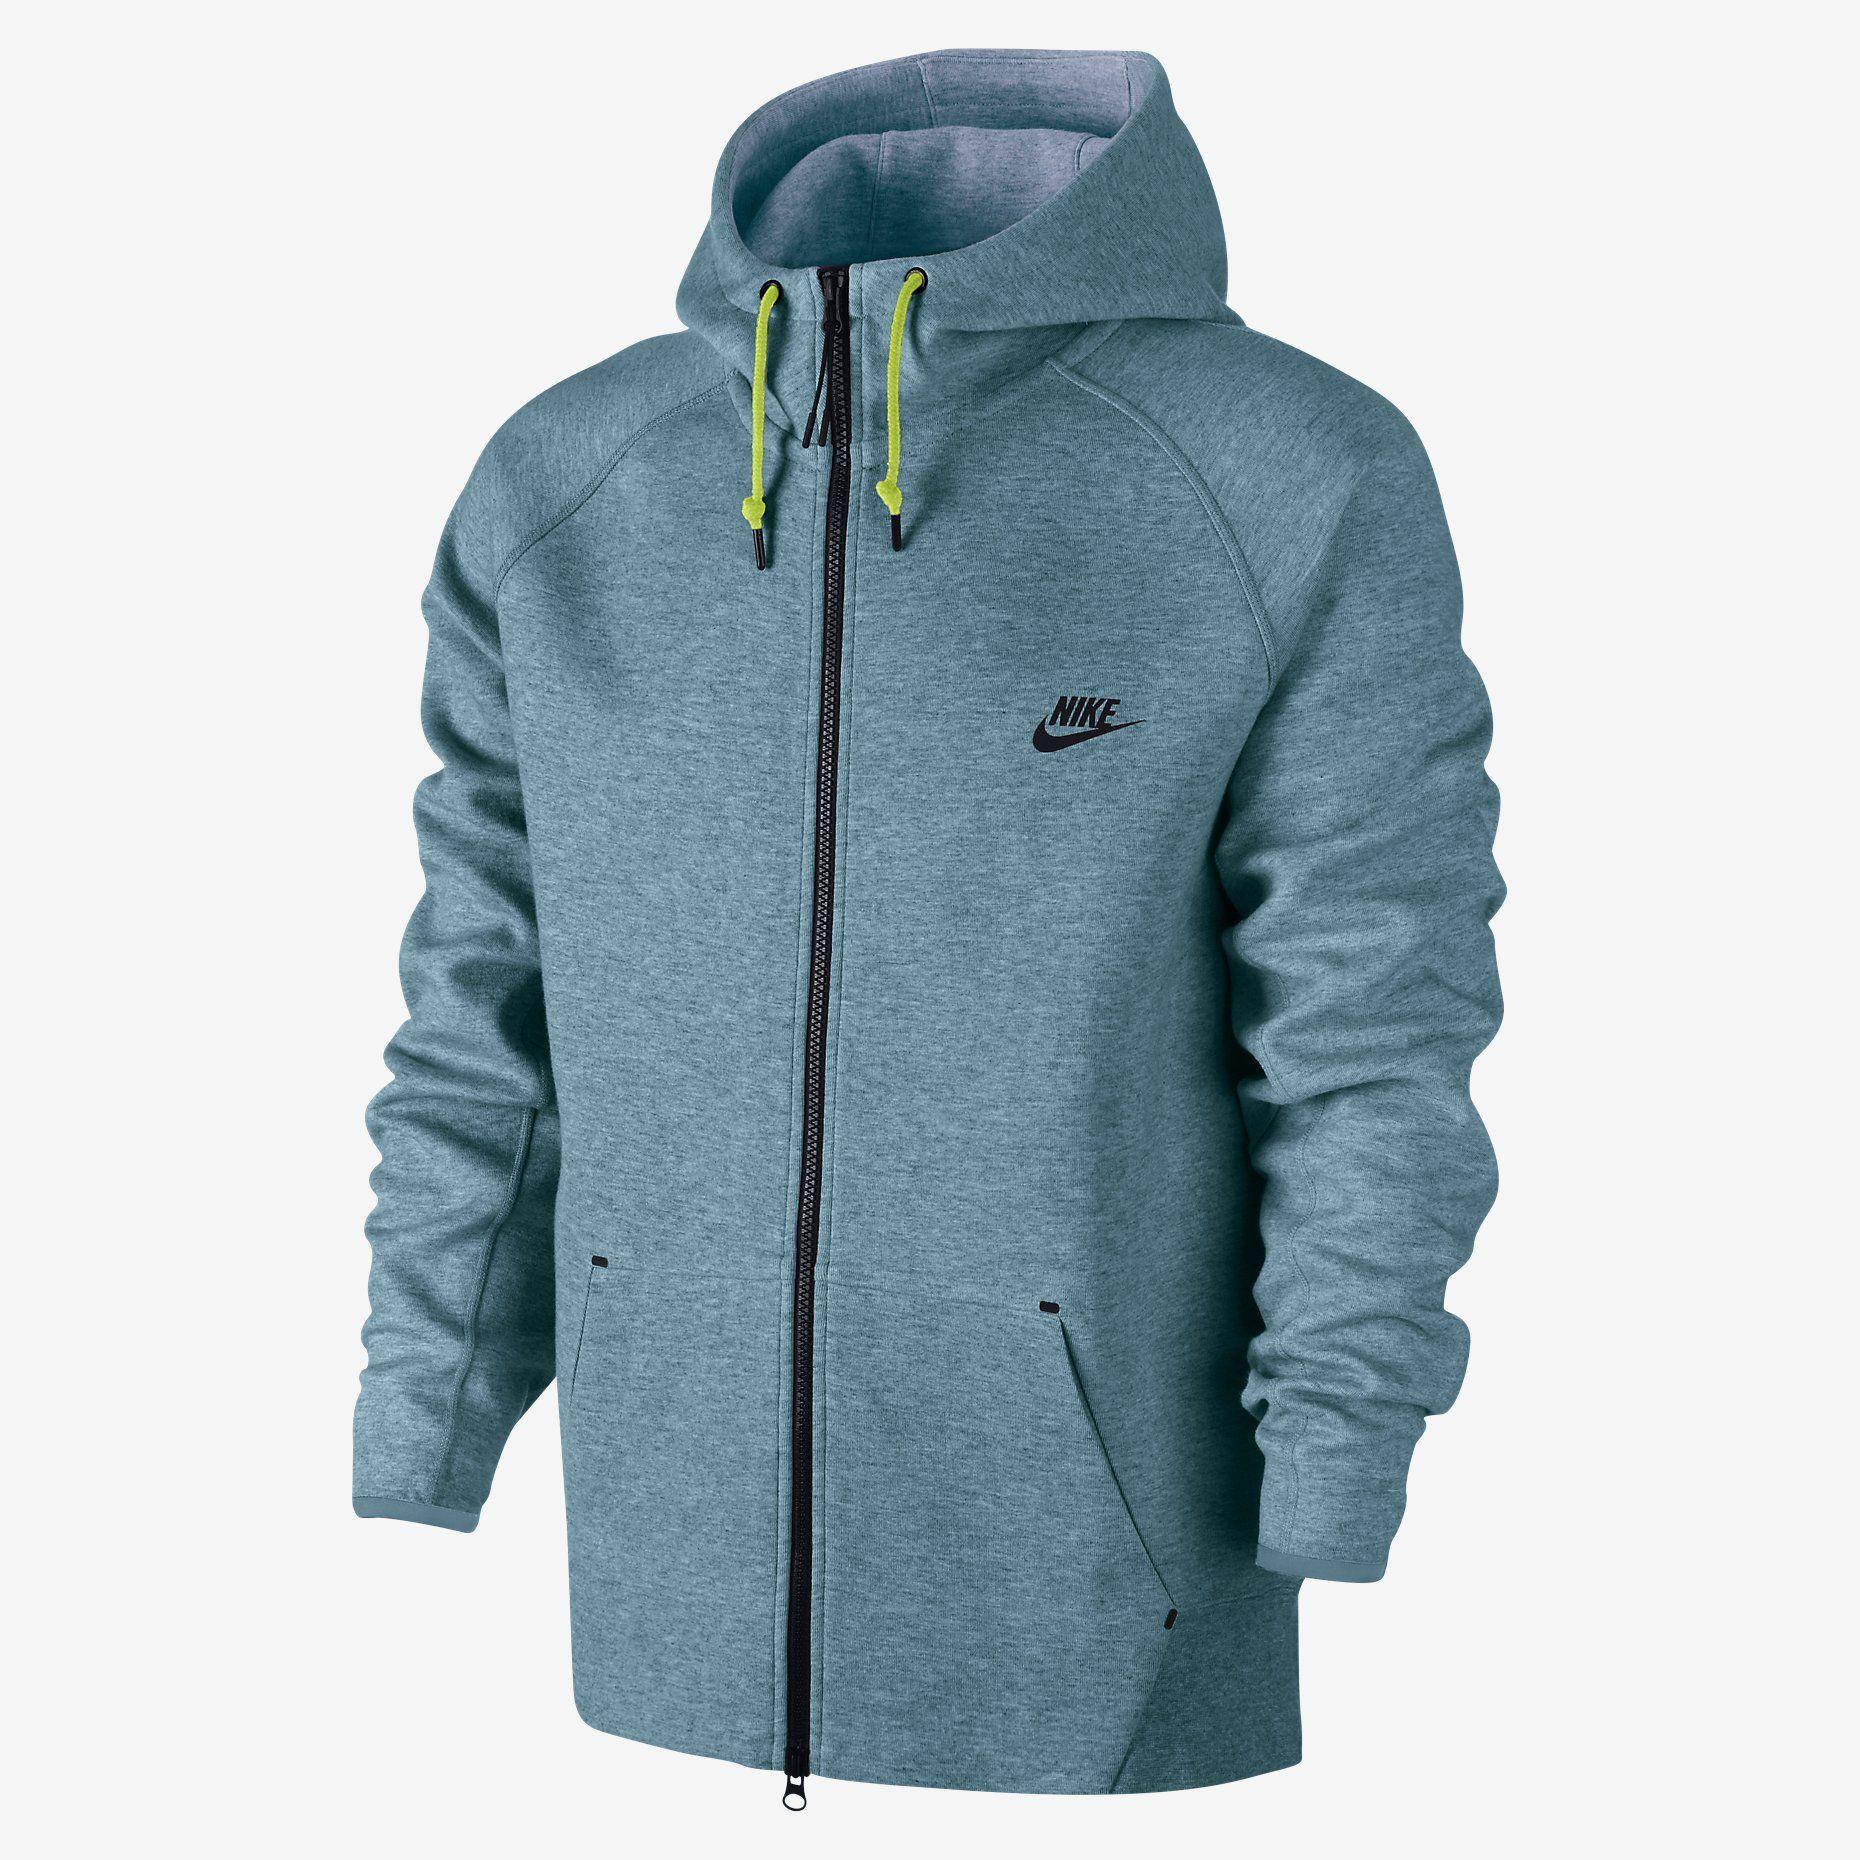 Nike Tech Fleece AW77 1.0 Full-Zip Men's Hoodie